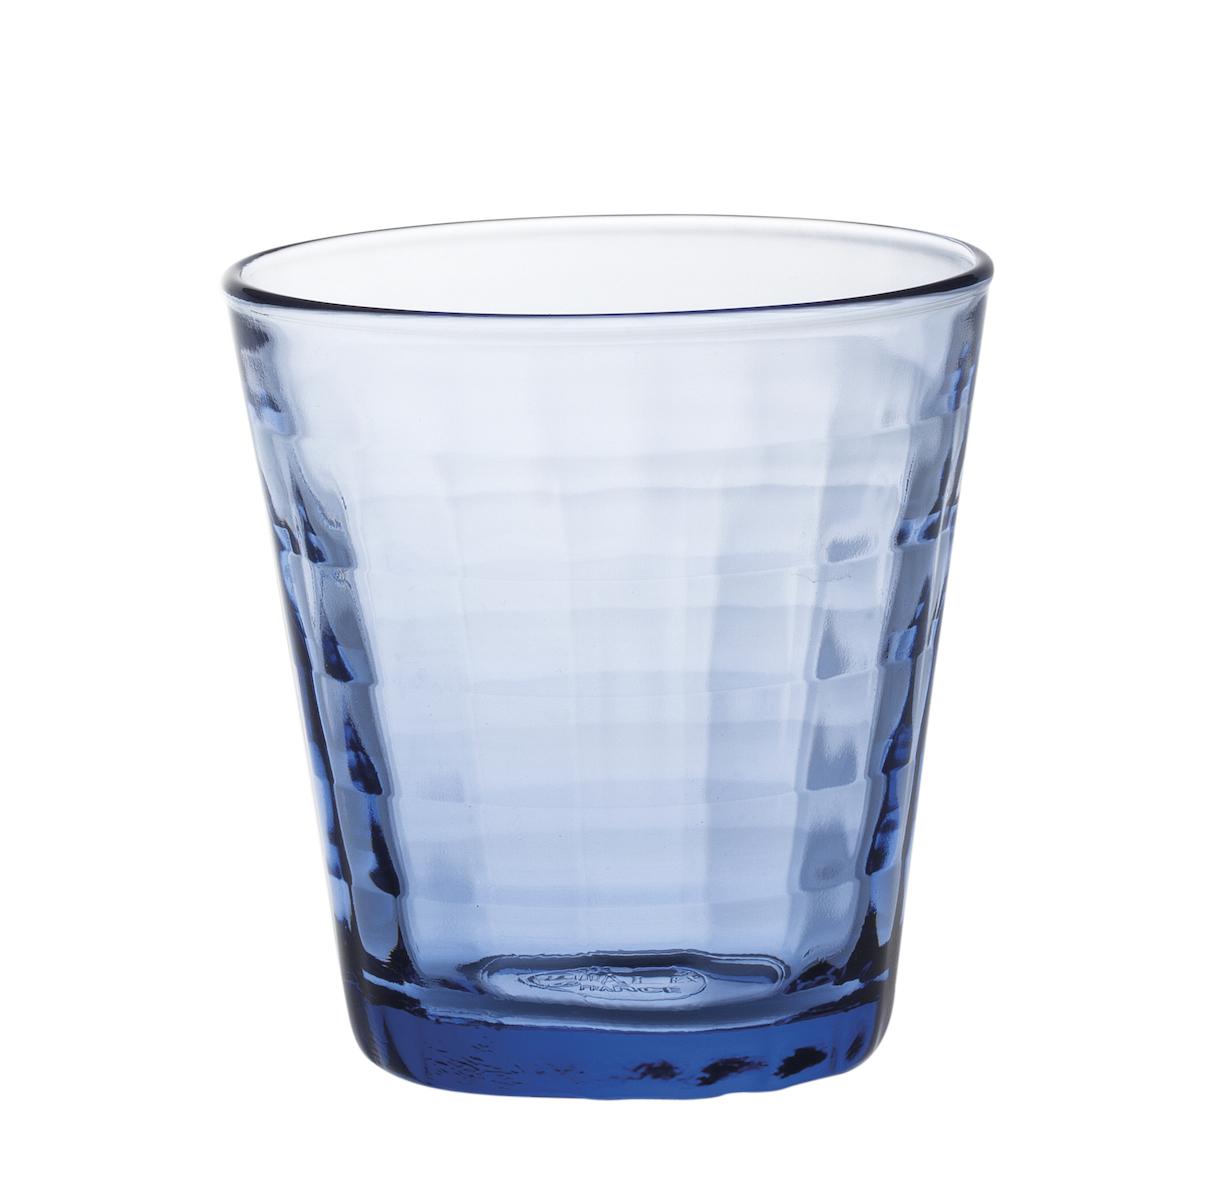 DURALEX デュラレックス プリズム マリン 220ml フランス グラス 透明 セール 30%off SALE 期間限定で特別価格 全面耐熱 食器 強化ガラス 電子レンジ カフェ 30%OFF 割引 上品 食洗機